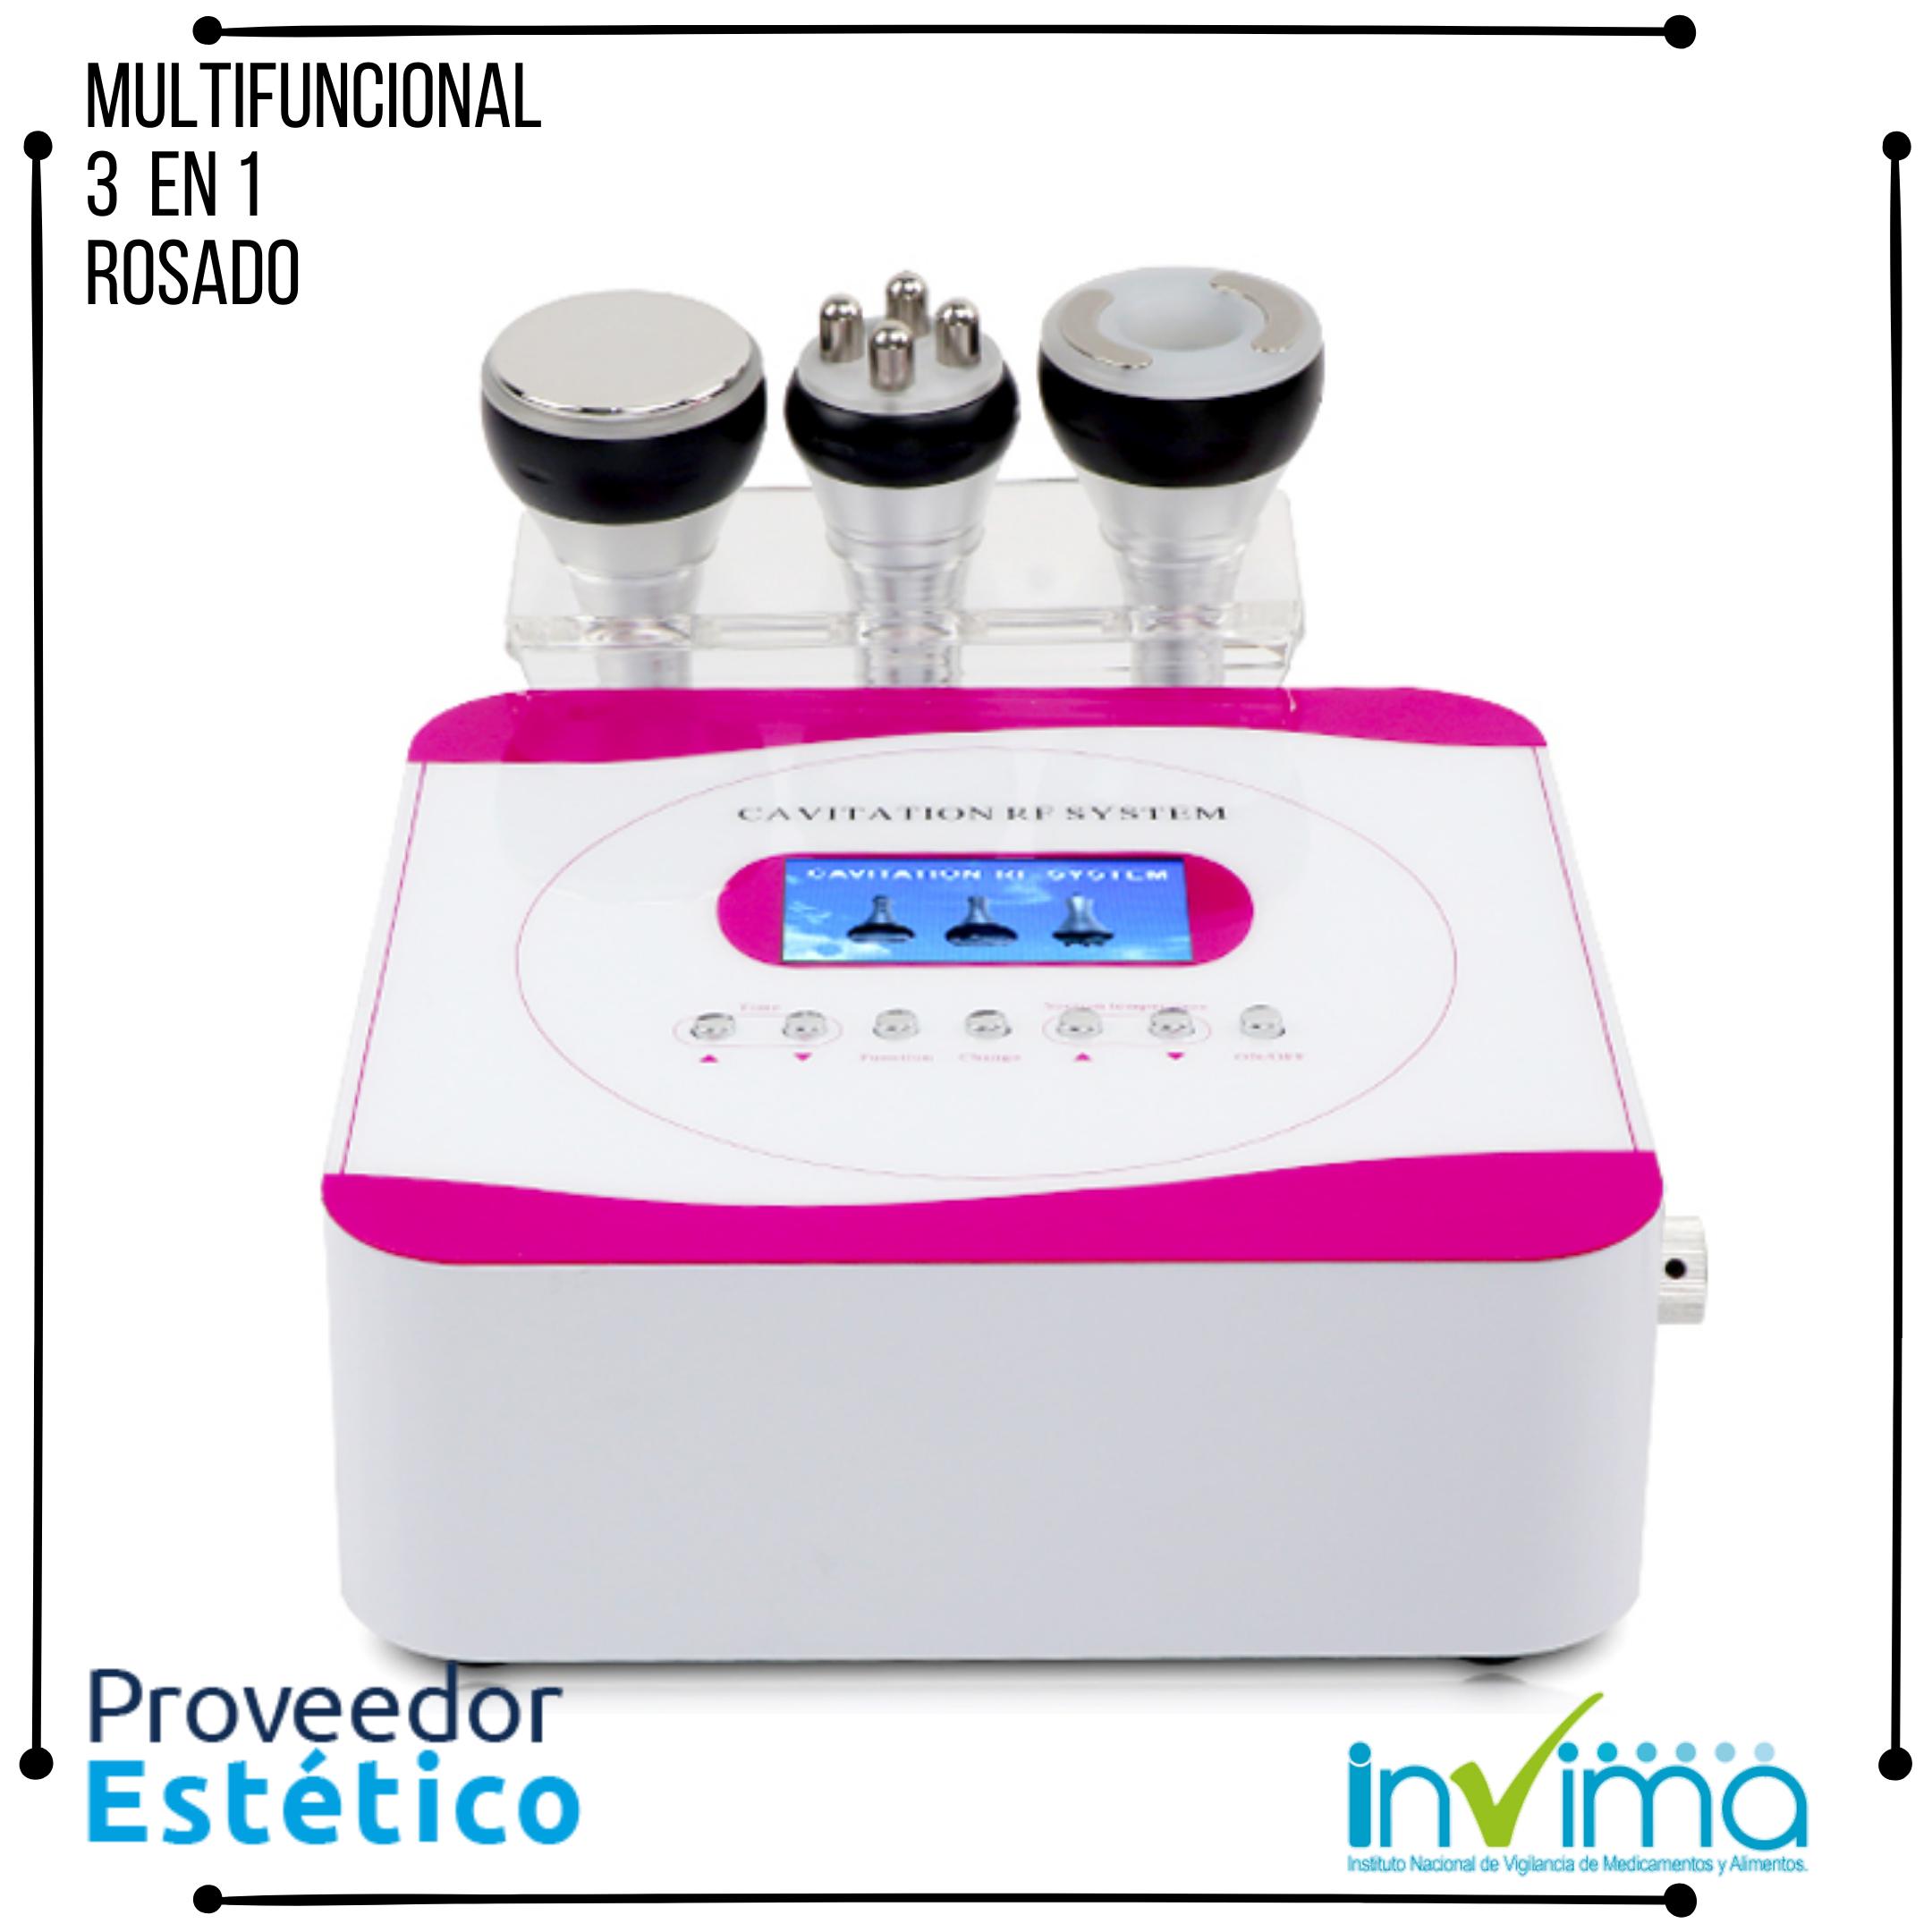 https://0201.nccdn.net/1_2/000/000/11b/bdb/multifuncional-cavitaci%C3%B3n-radiofrecuencia-3-en-1---3-.png